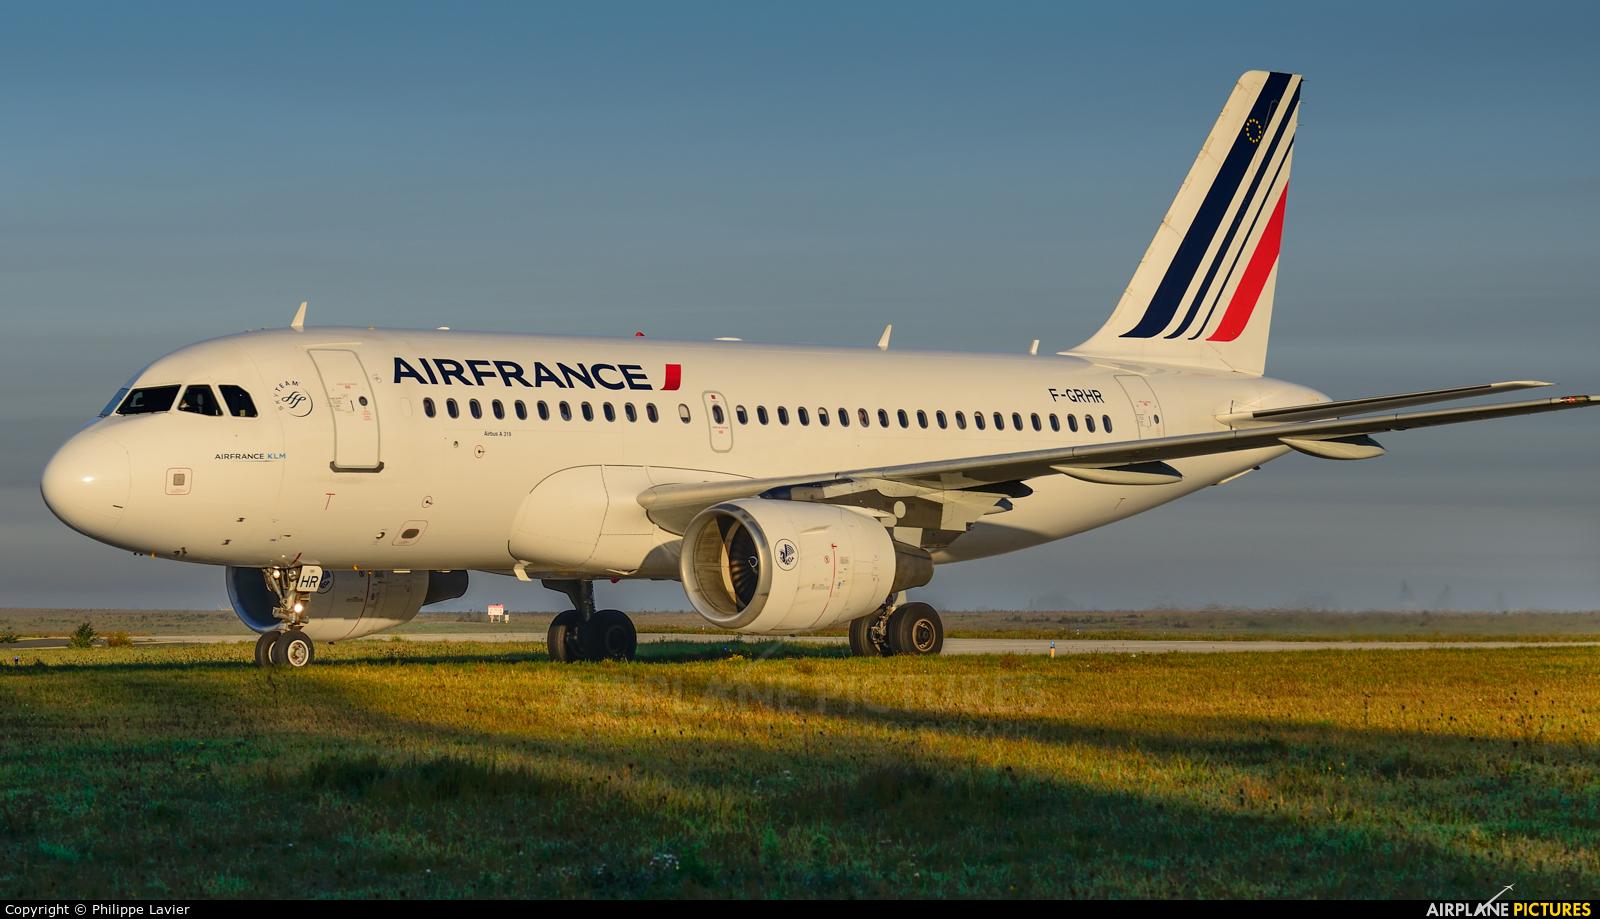 Air France F-GRHR aircraft at Paris - Charles de Gaulle